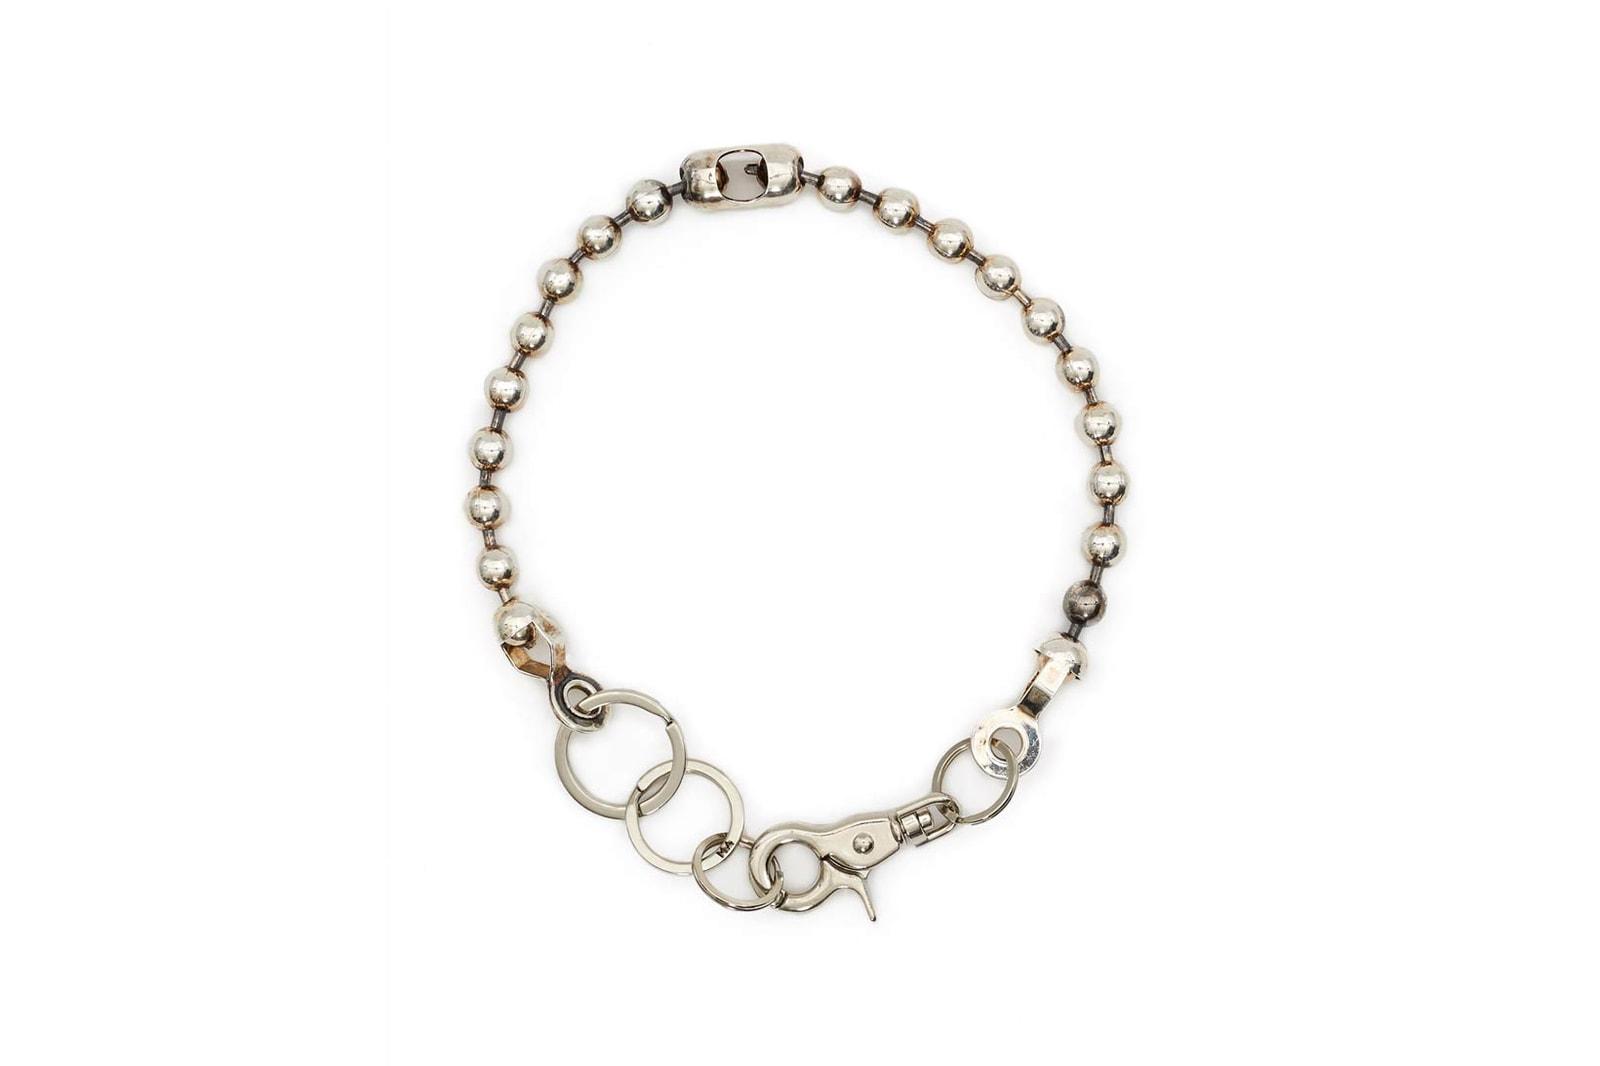 Martine Ali Chain Bracelet